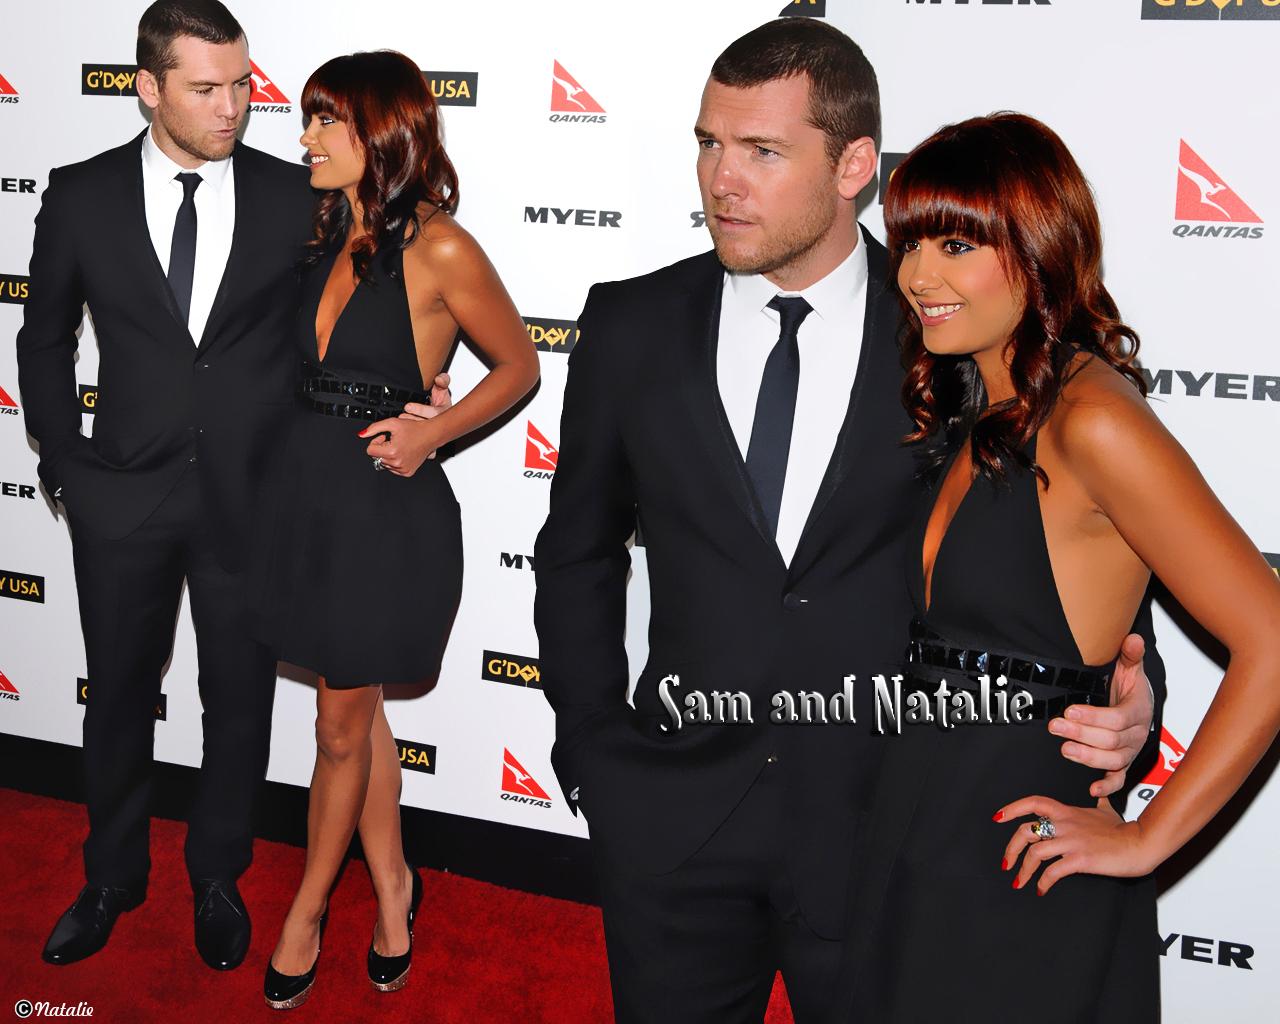 Sam and Natalie